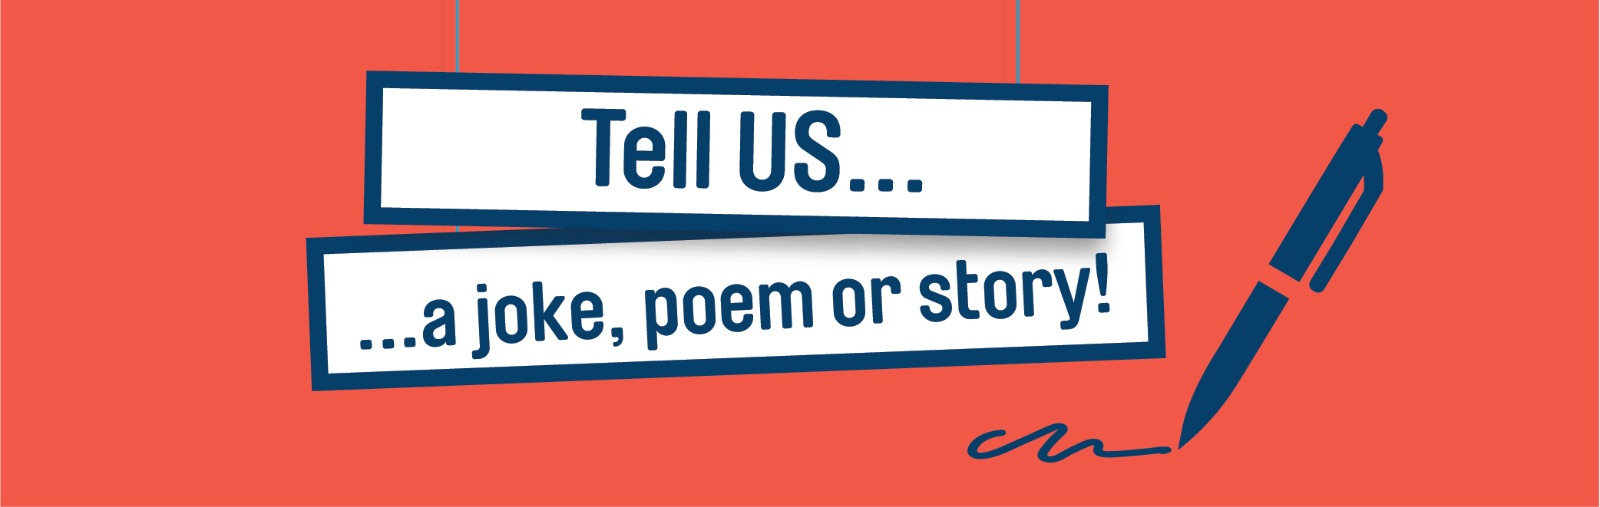 Tell US a joke, poem or story!